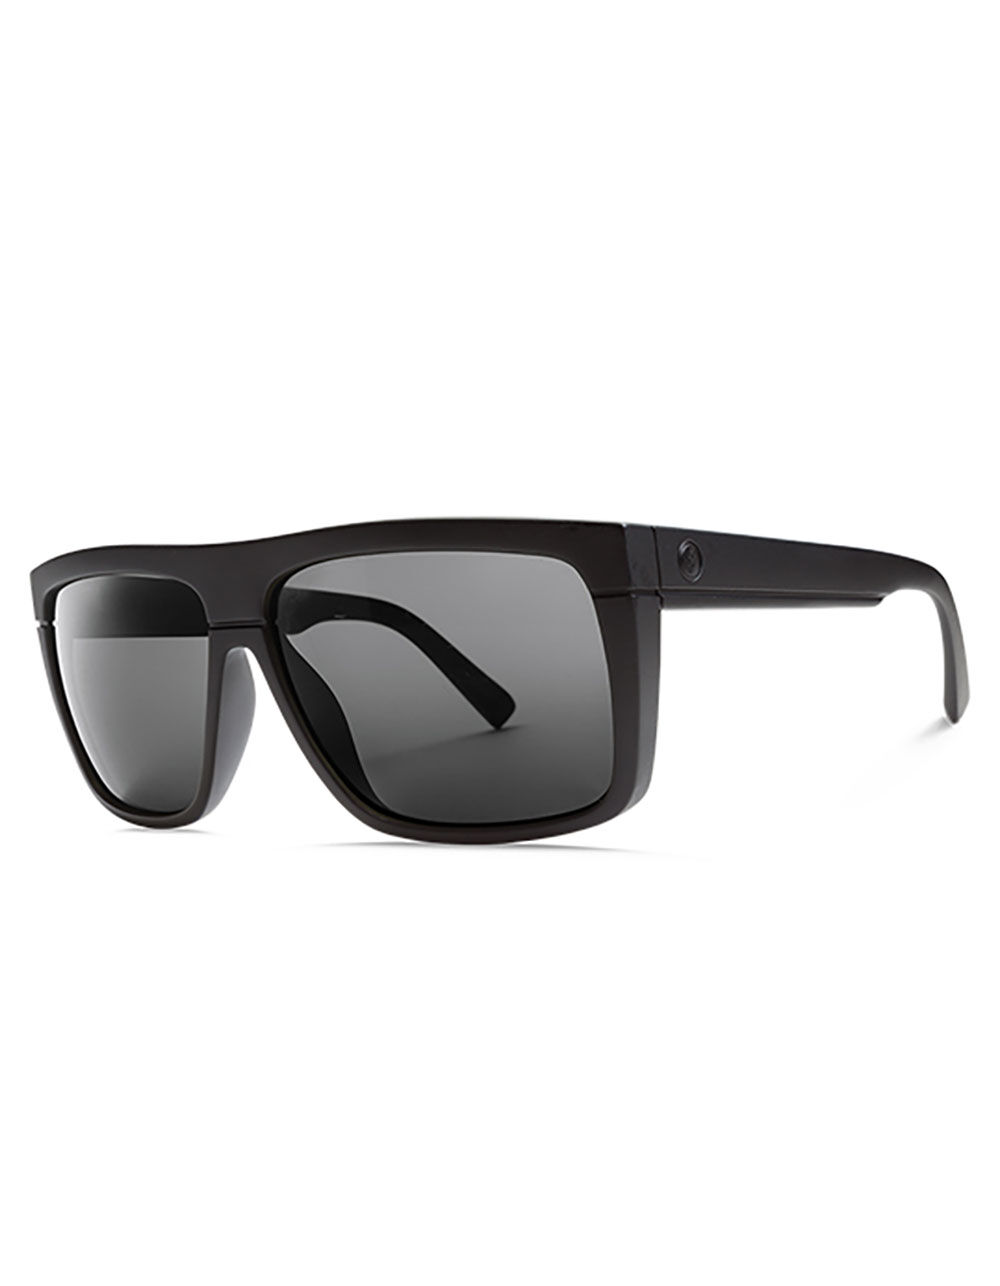 ELECTRIC Black Top Polarized Sunglasses